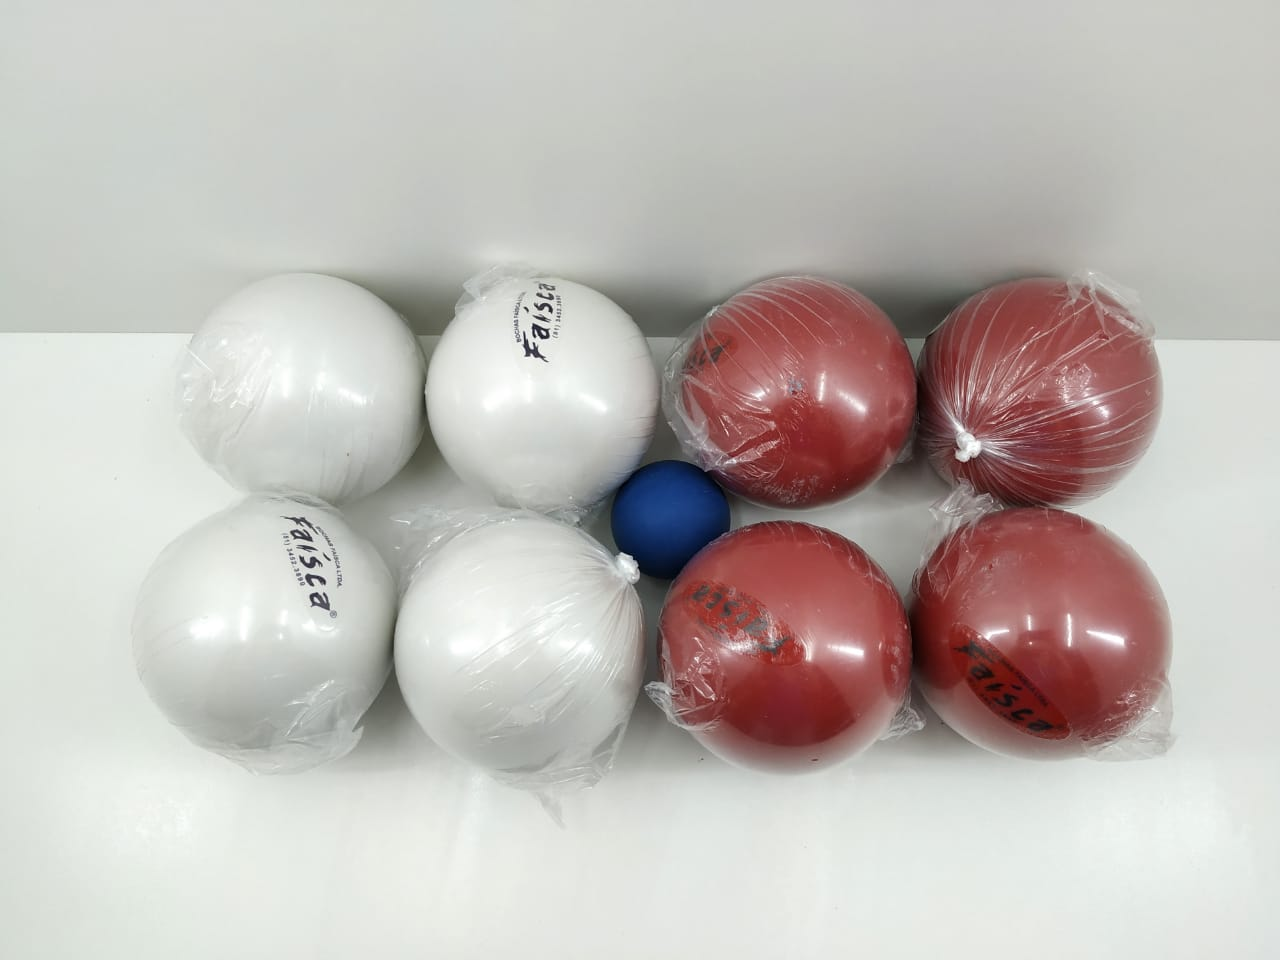 Jogo de Bocha Bola de Massa Faísca Tradicional C/8 Bolas + Balin 1,380Kg